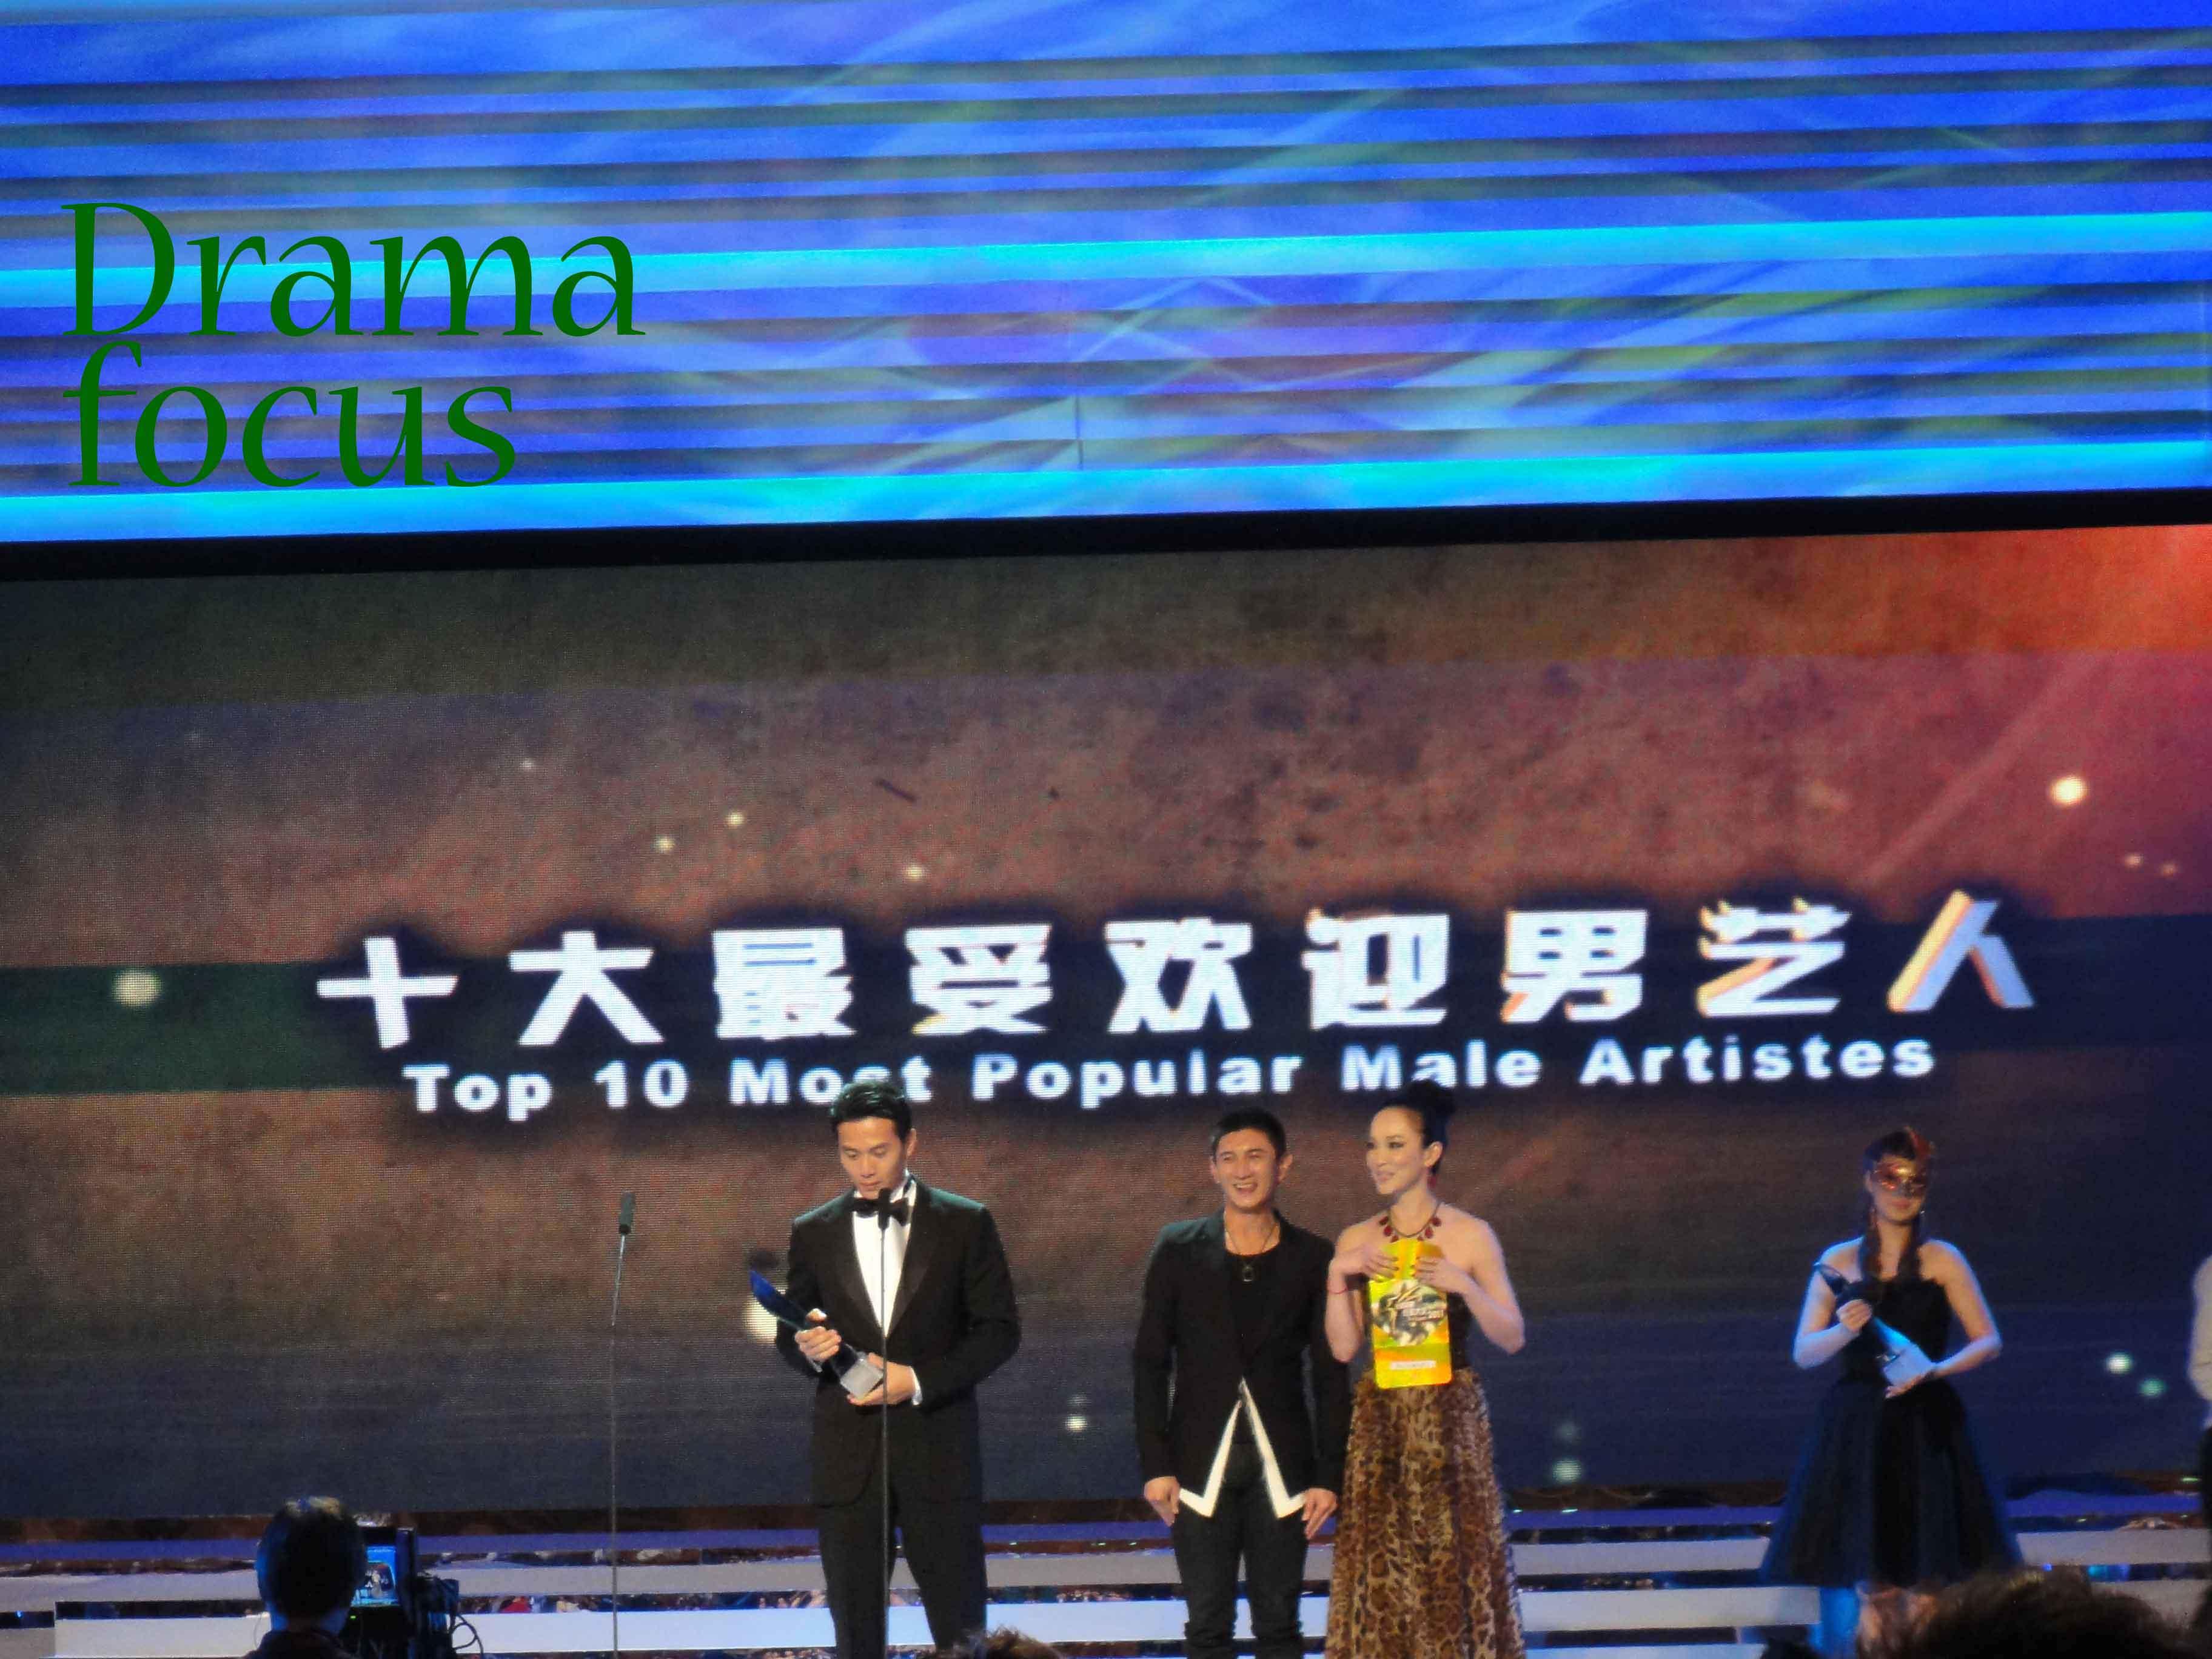 Star Awards 红星大奖 2011: Results